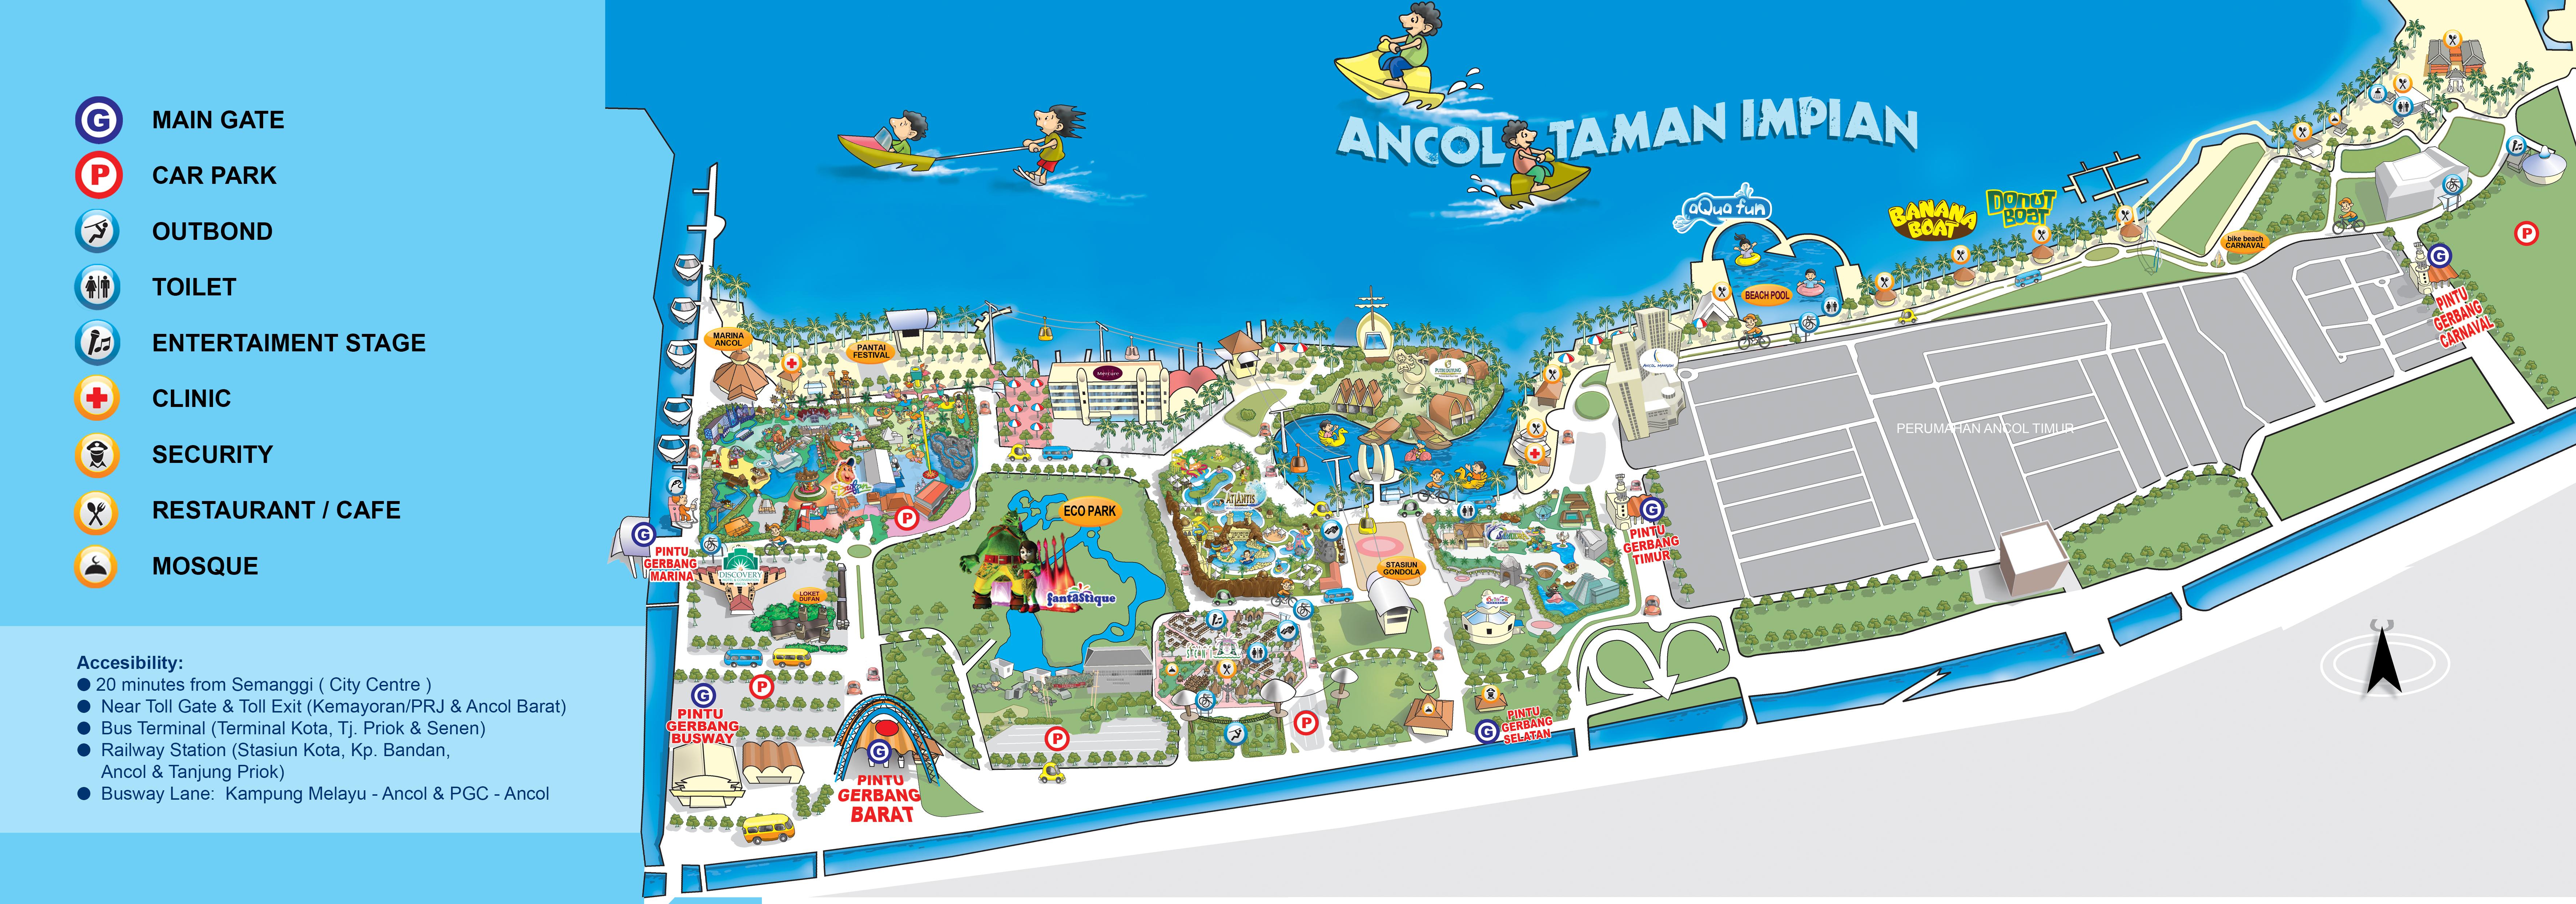 Peta Jpg Sign Waterbom Jakarta Kota Administrasi Utara